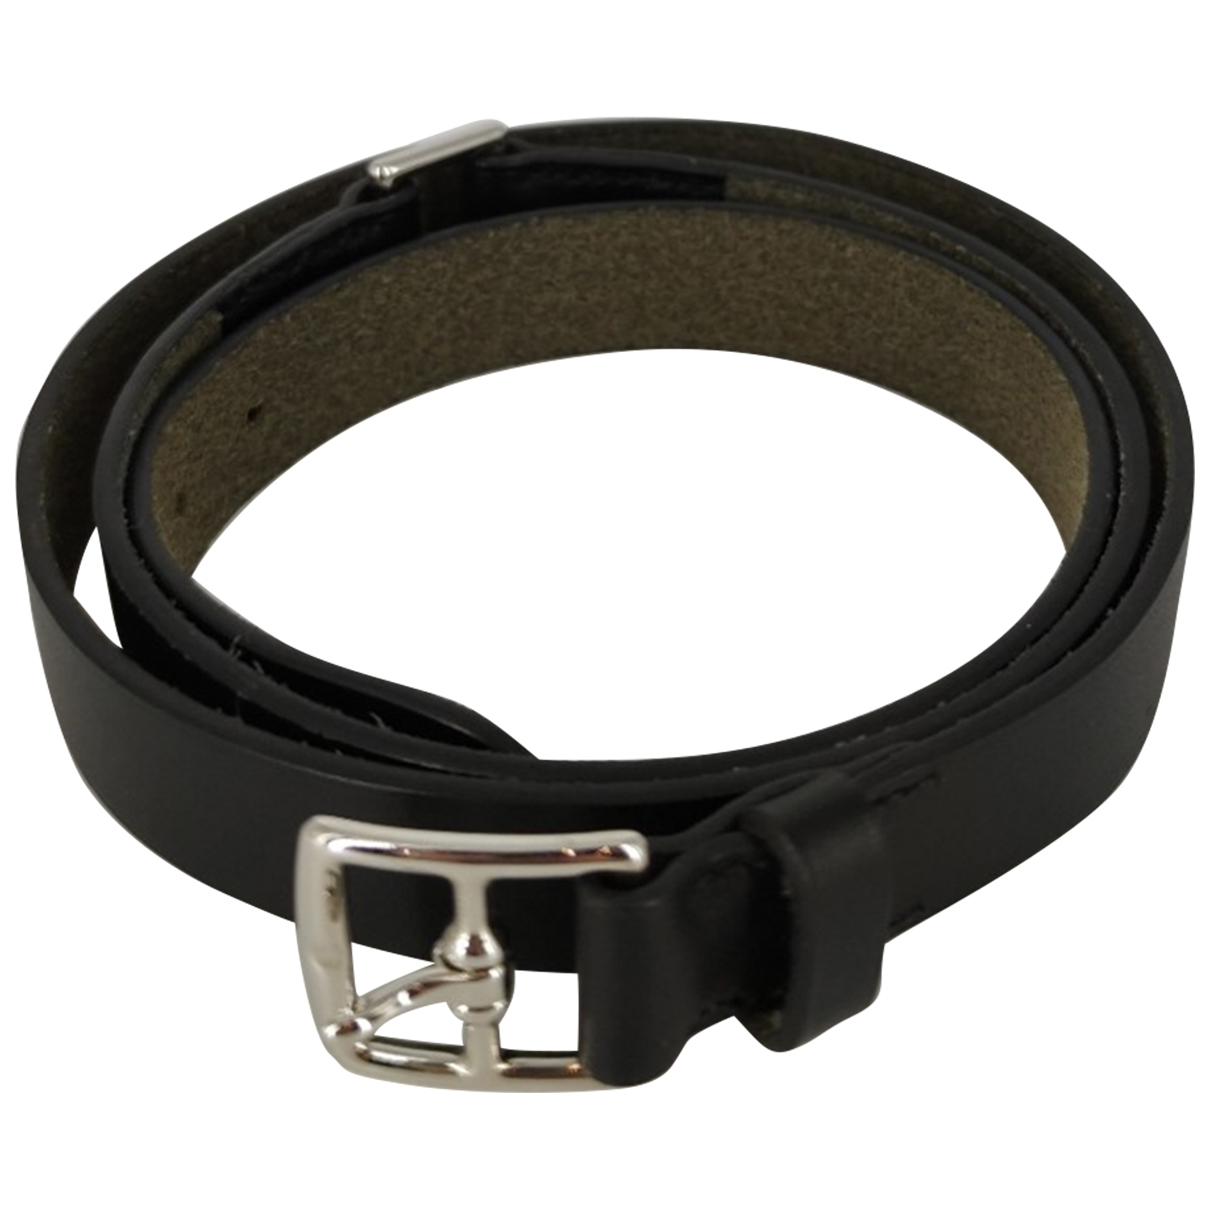 Hermès \N Black Leather belt for Women 90 cm